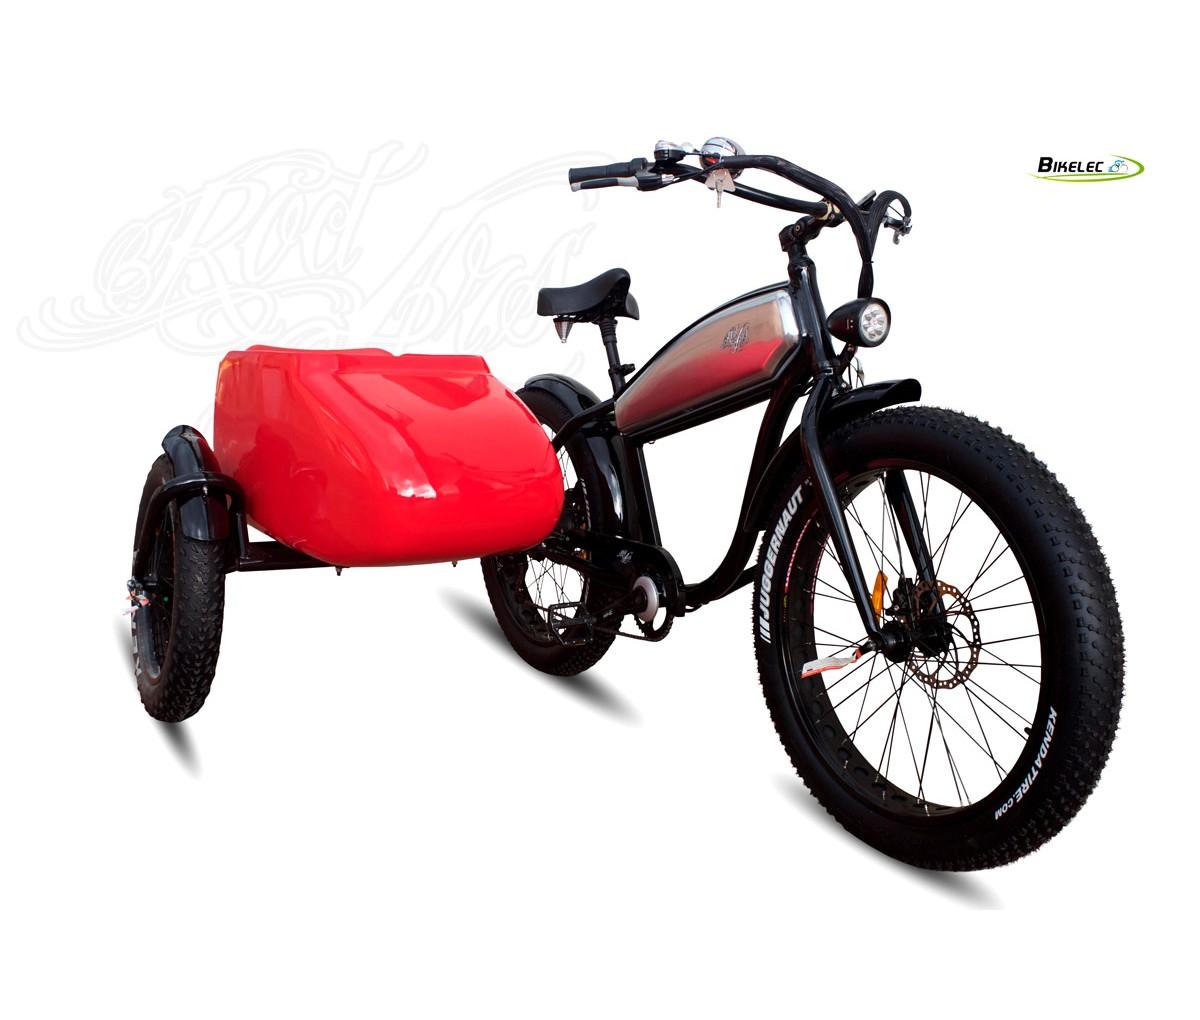 Foto Bikelec Sidecar Electrico Dr Jones